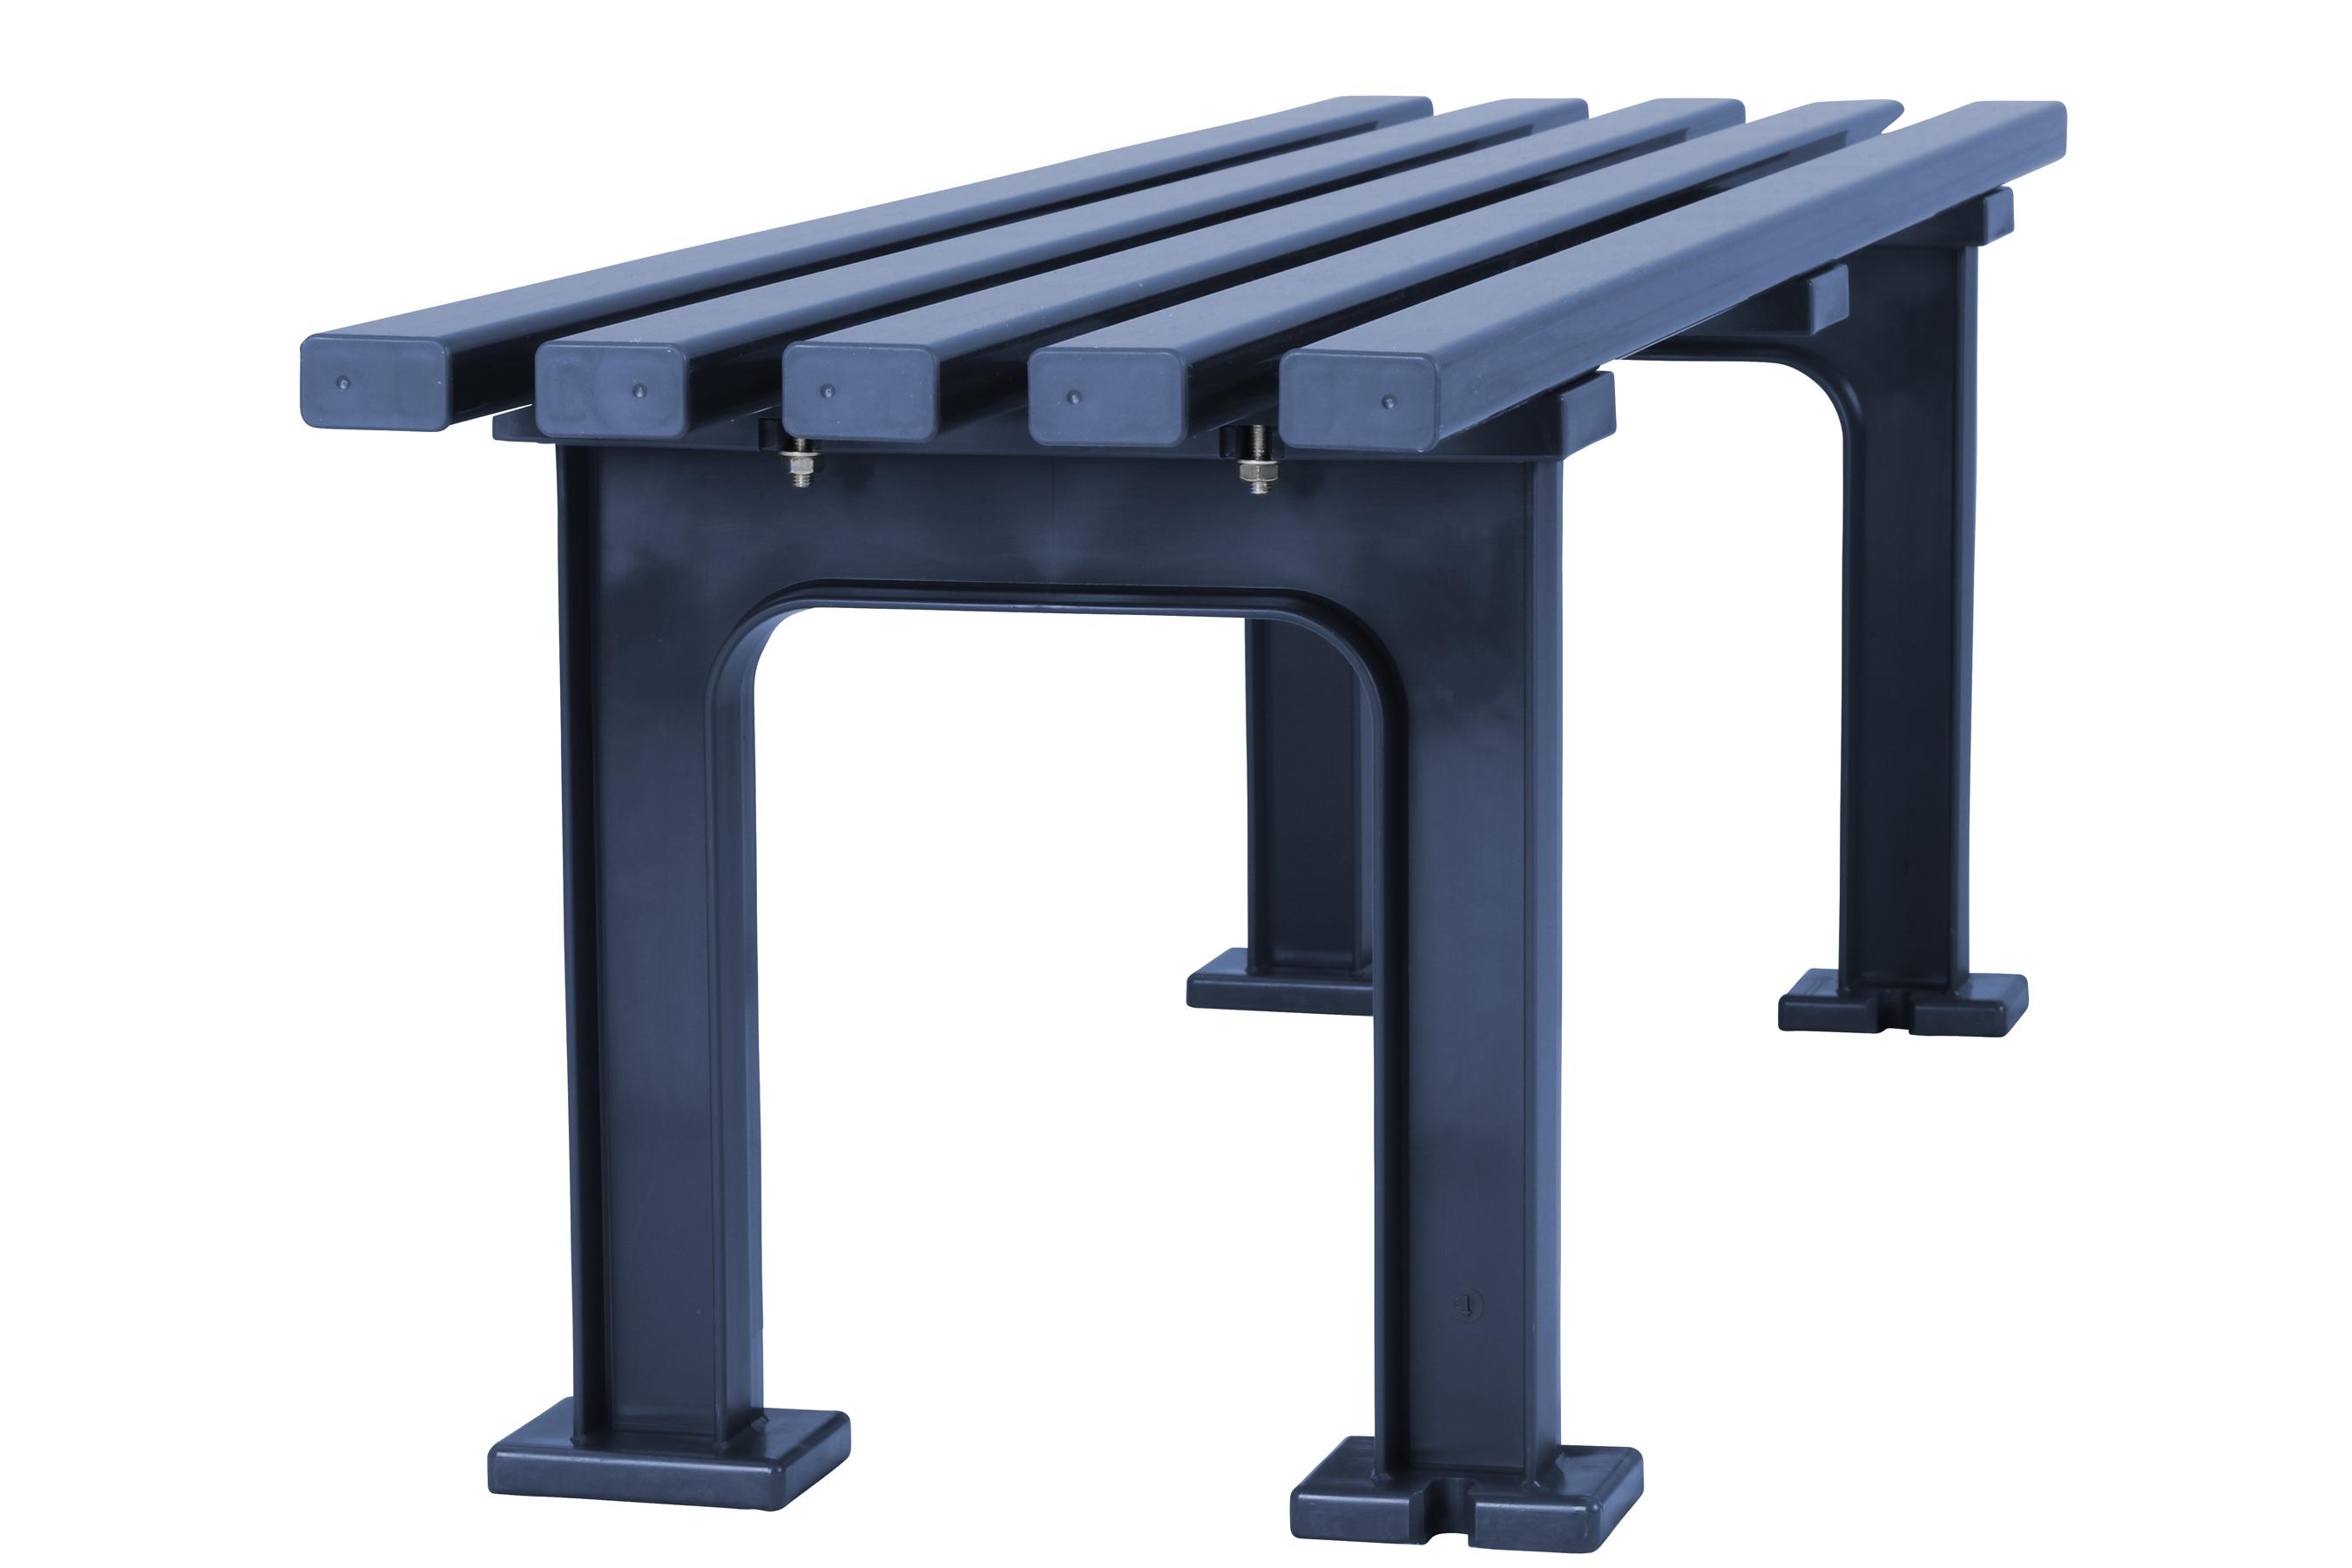 Blome Gartenbank / 4-Sitzer Bank Mono II Kunststoff blau 200cm Bild 3